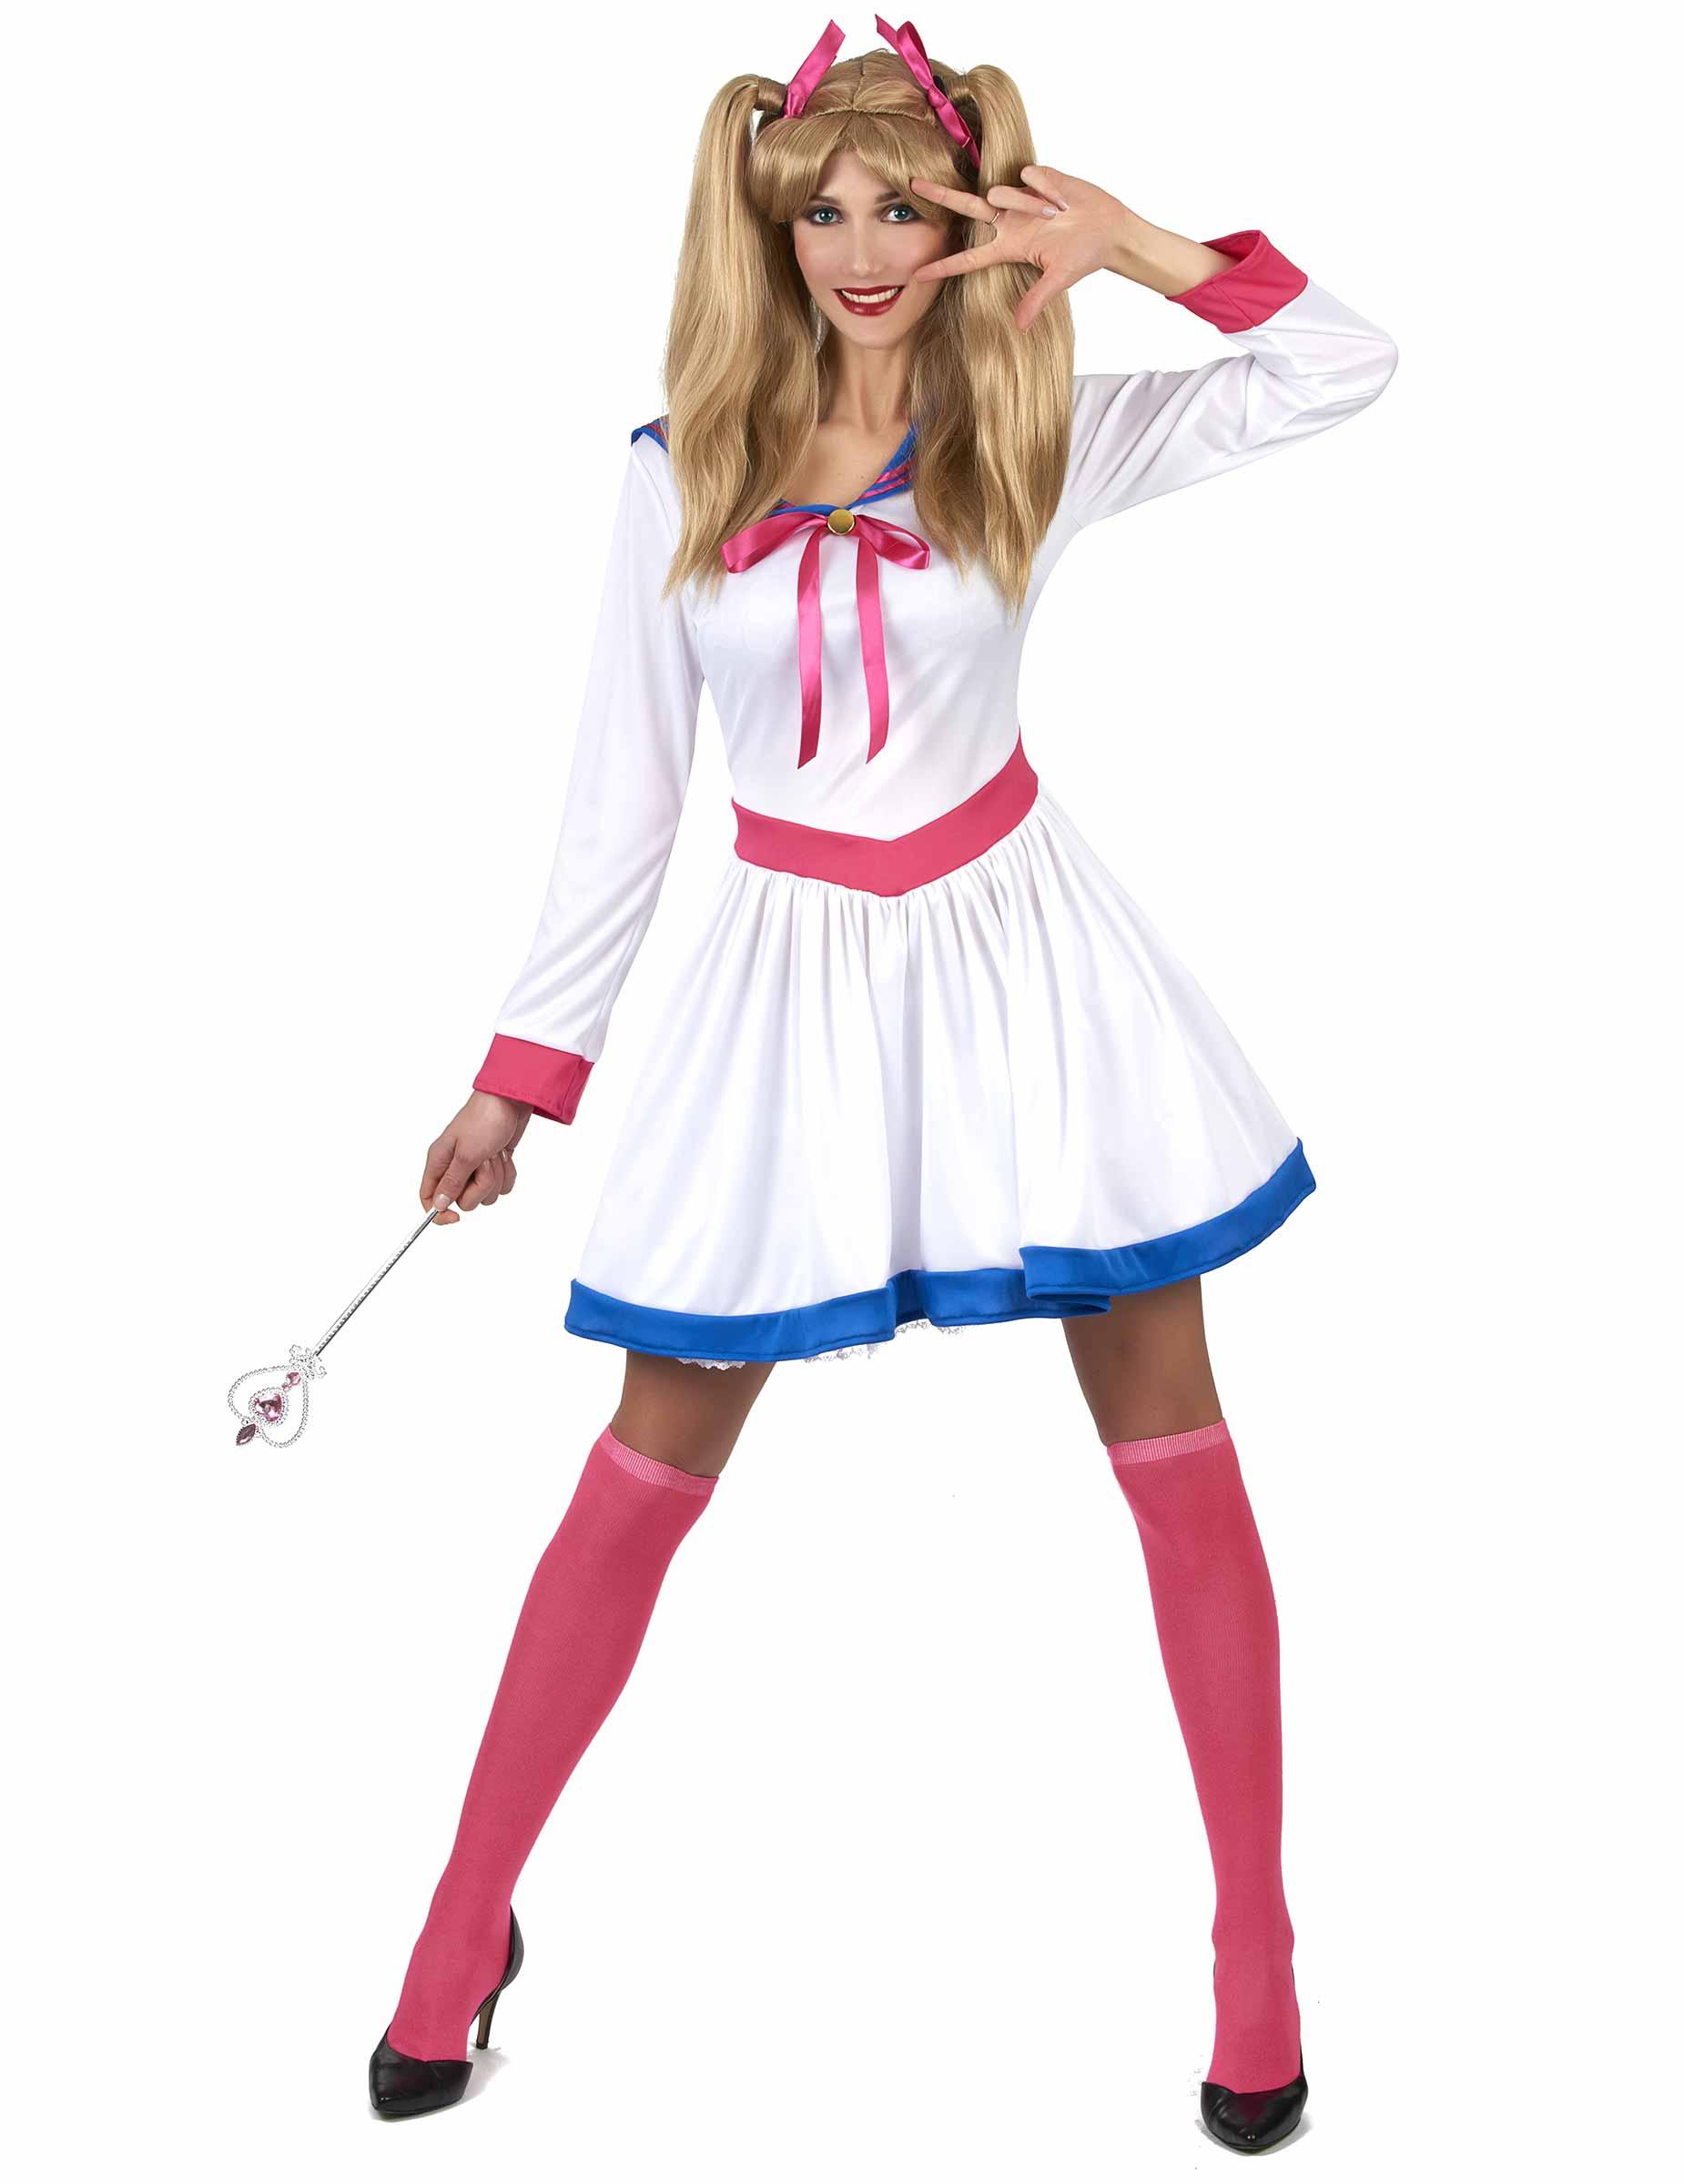 Comic Heldin Damenkostum Mangakostum Weiss Pink Blau Gunstige